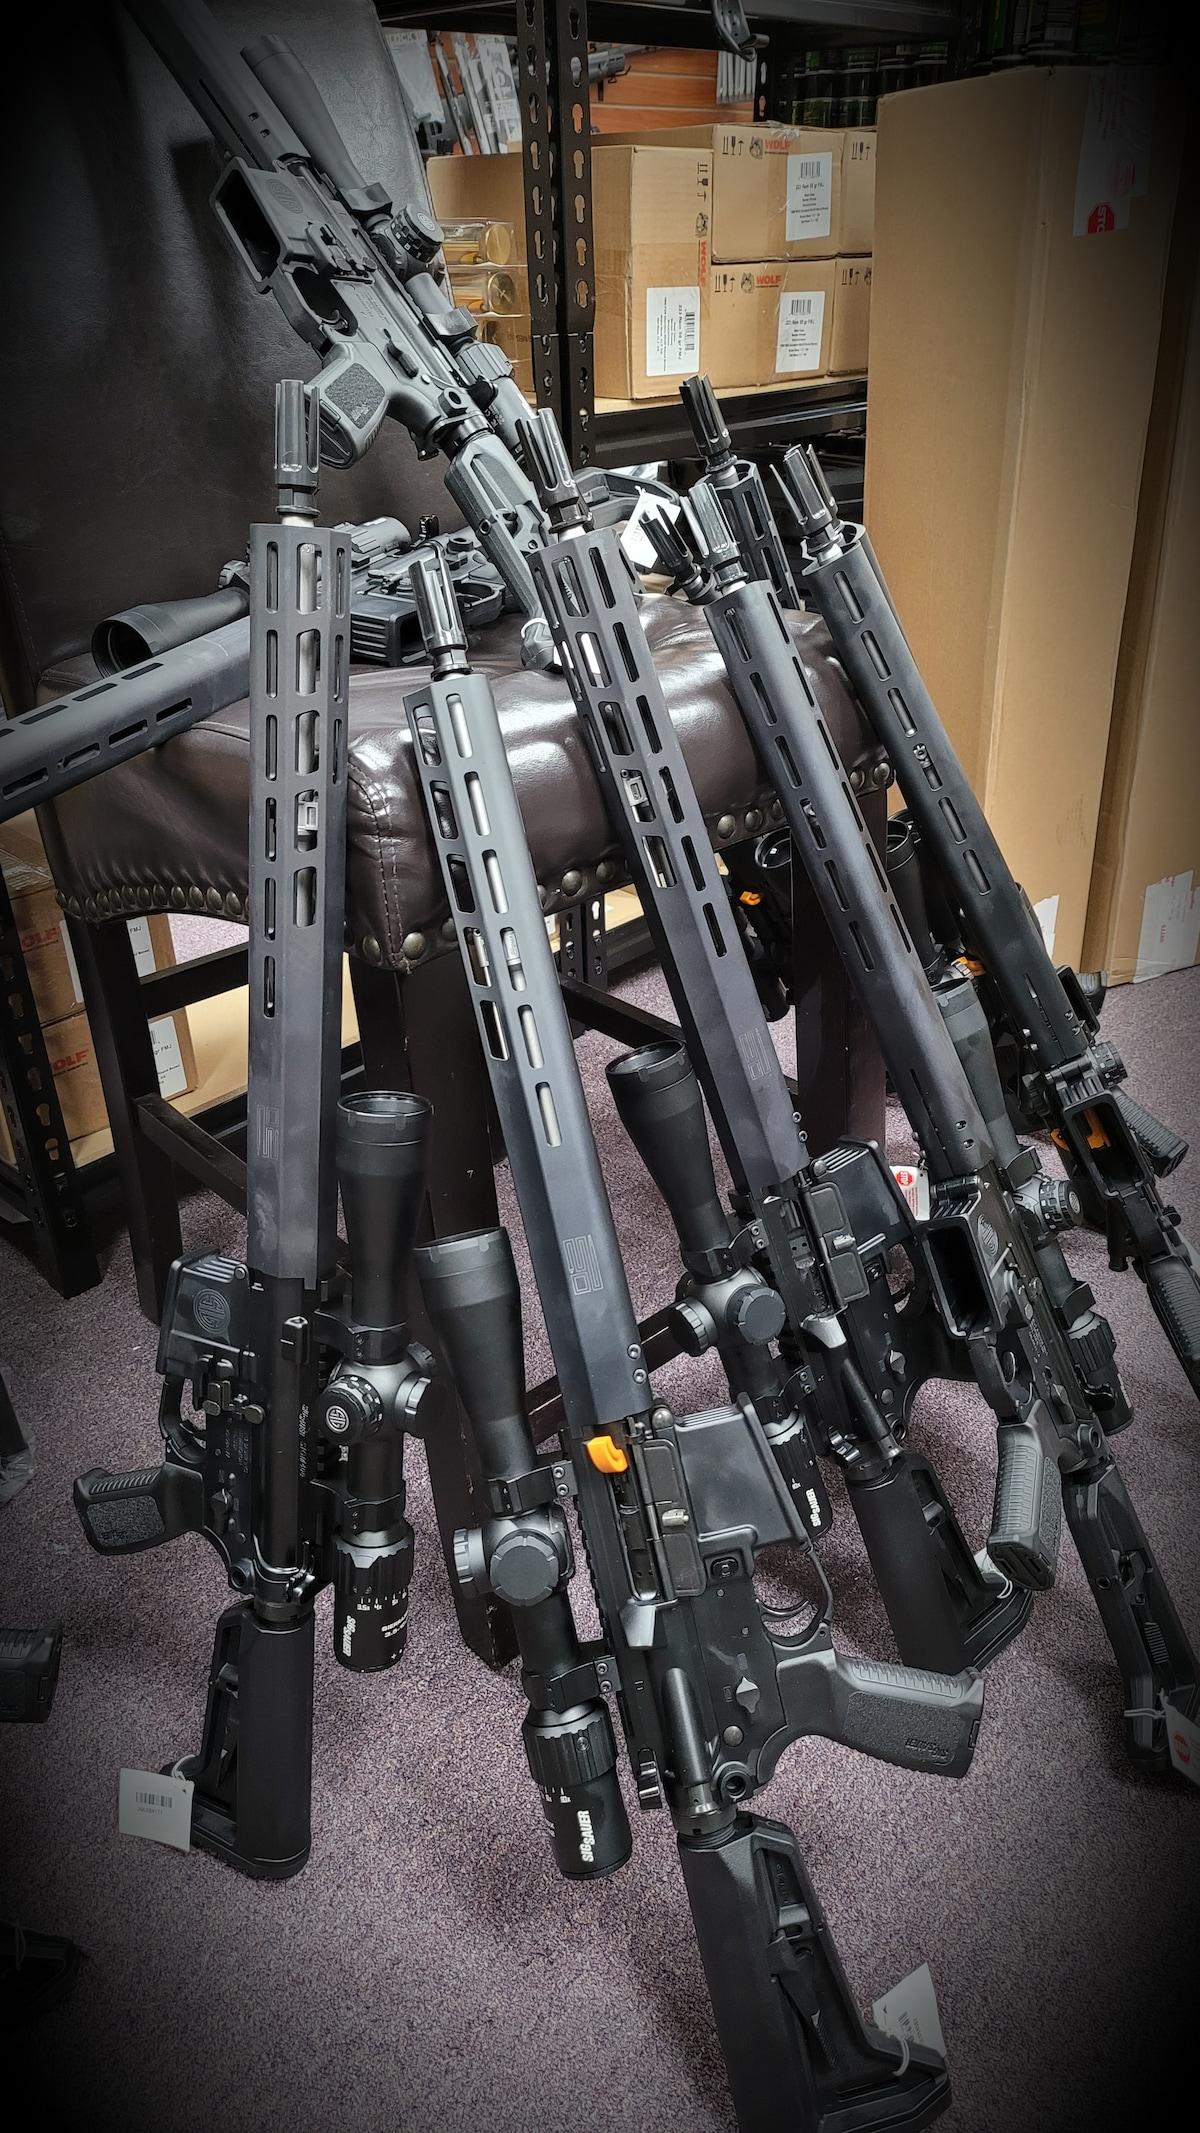 "SIG SAUER Sig Sauer M400 TREAD 5.56 NATO 16"" 30rd Black/Stainless Steel Rifle w/M-LOK and Sierra3 BDX Scope RM400-16B-TRD-BDX"